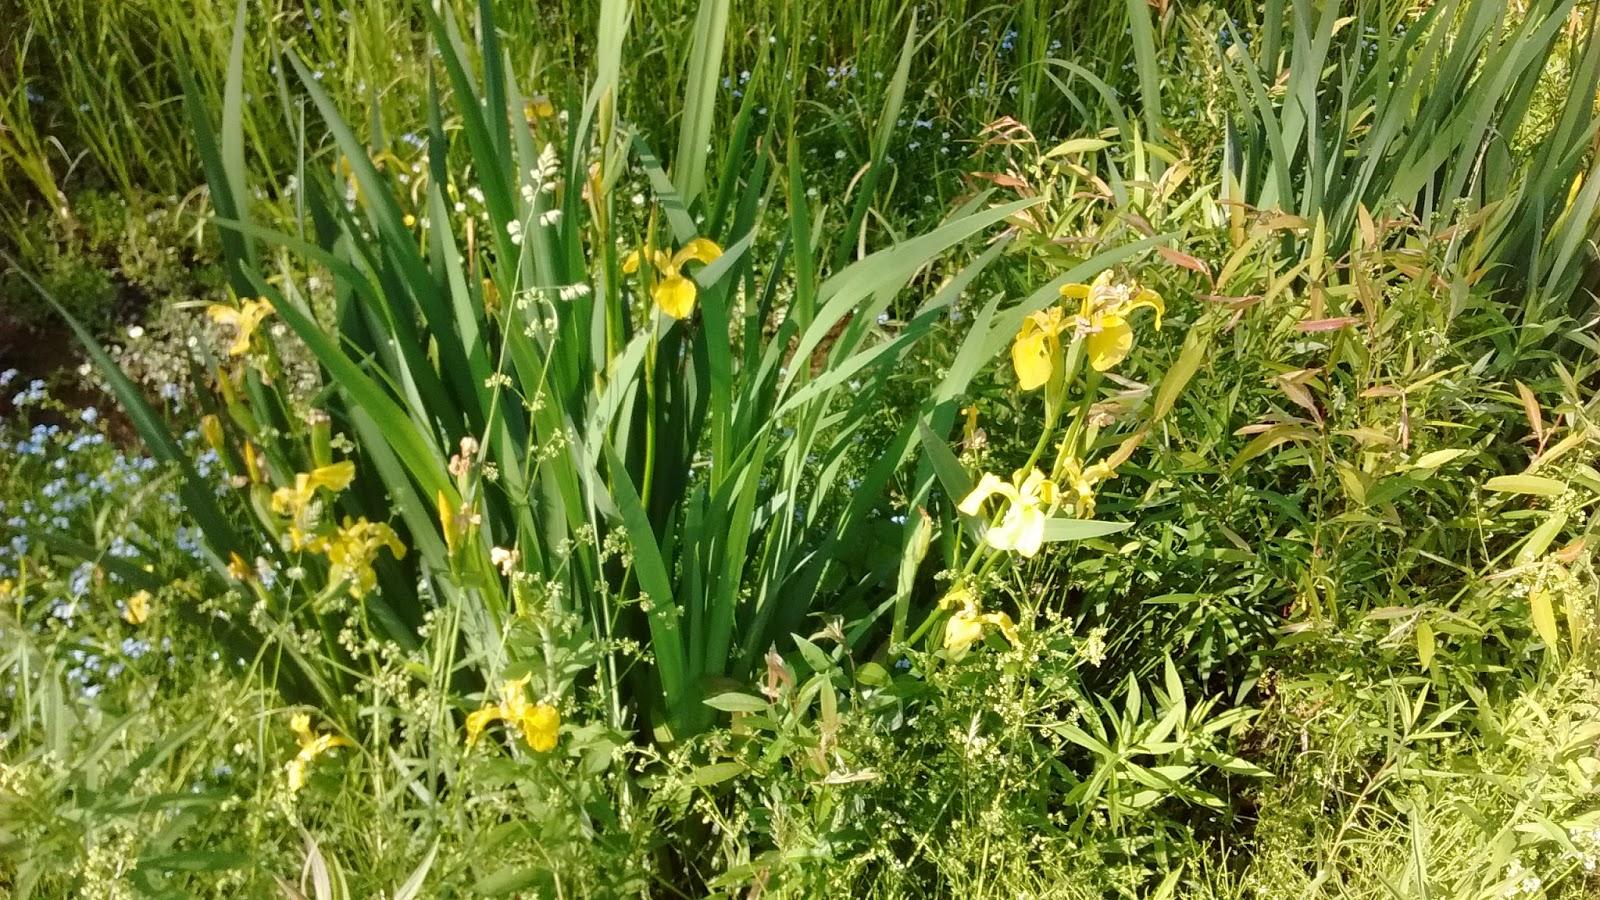 Iris Type Flowers Images Flower Wallpaper Hd